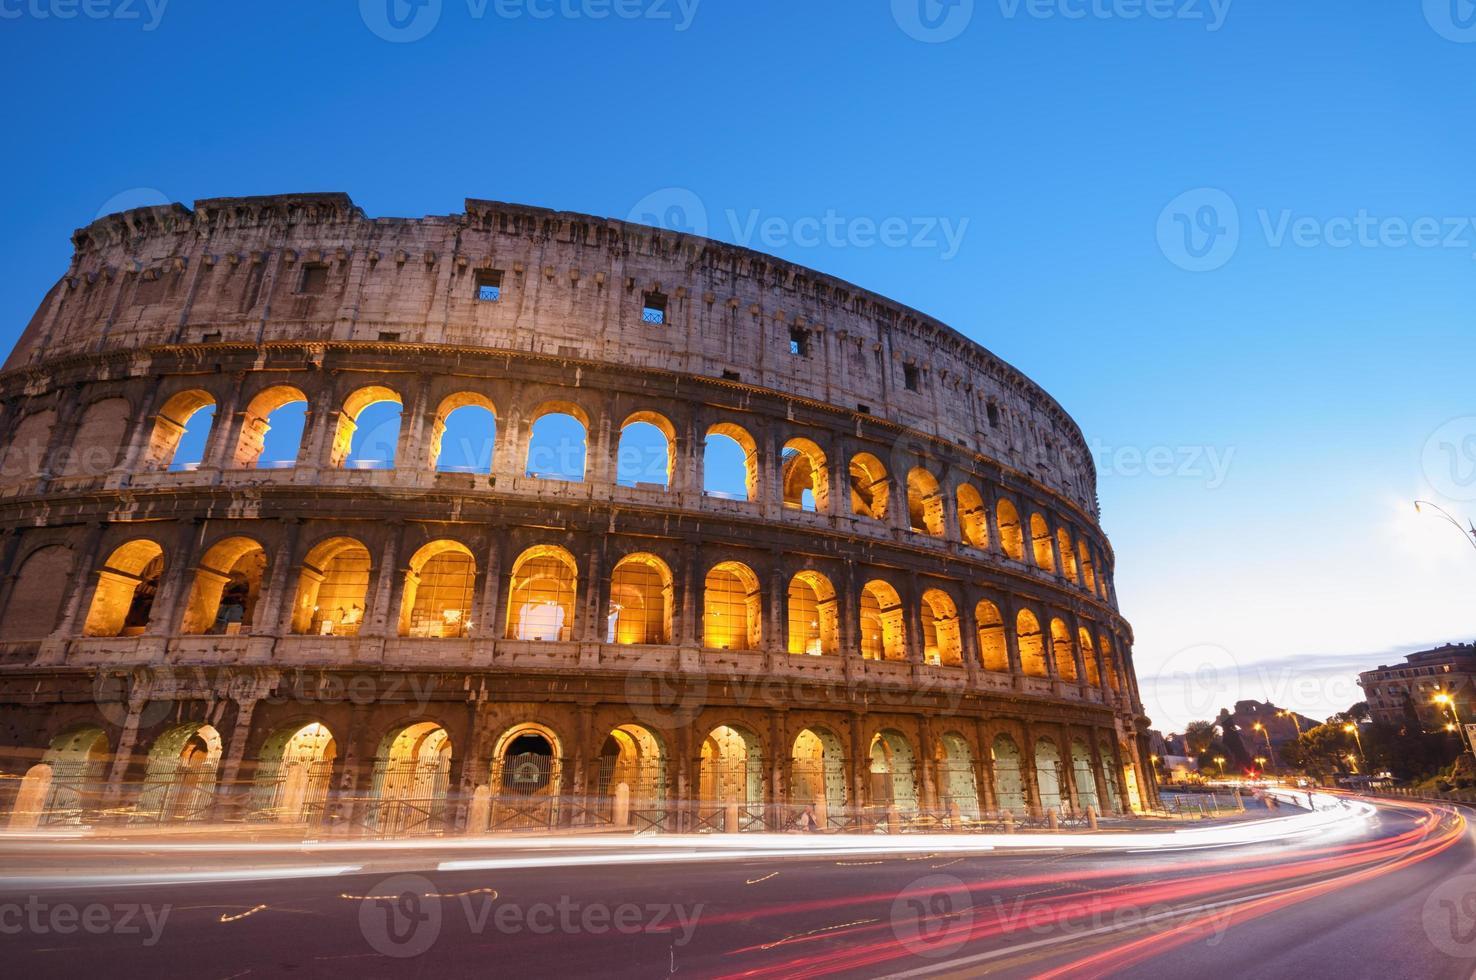 Colosseum, Rome - Italy photo